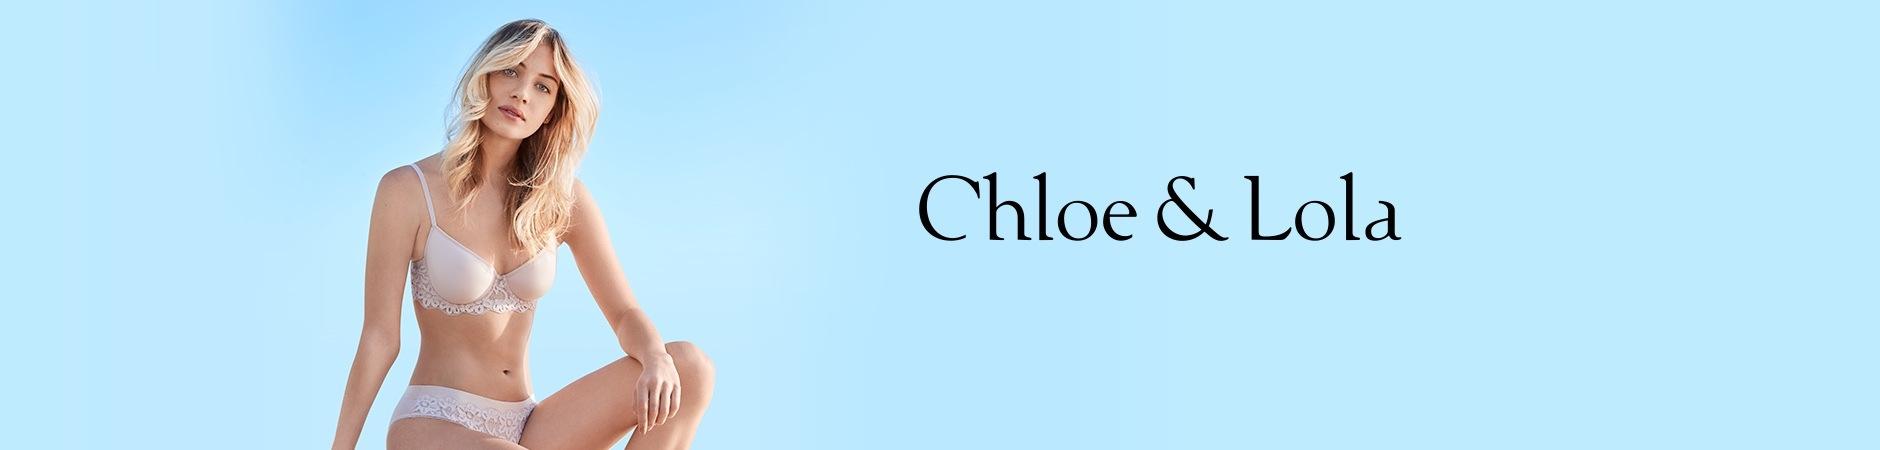 Chloe and Lola Banner